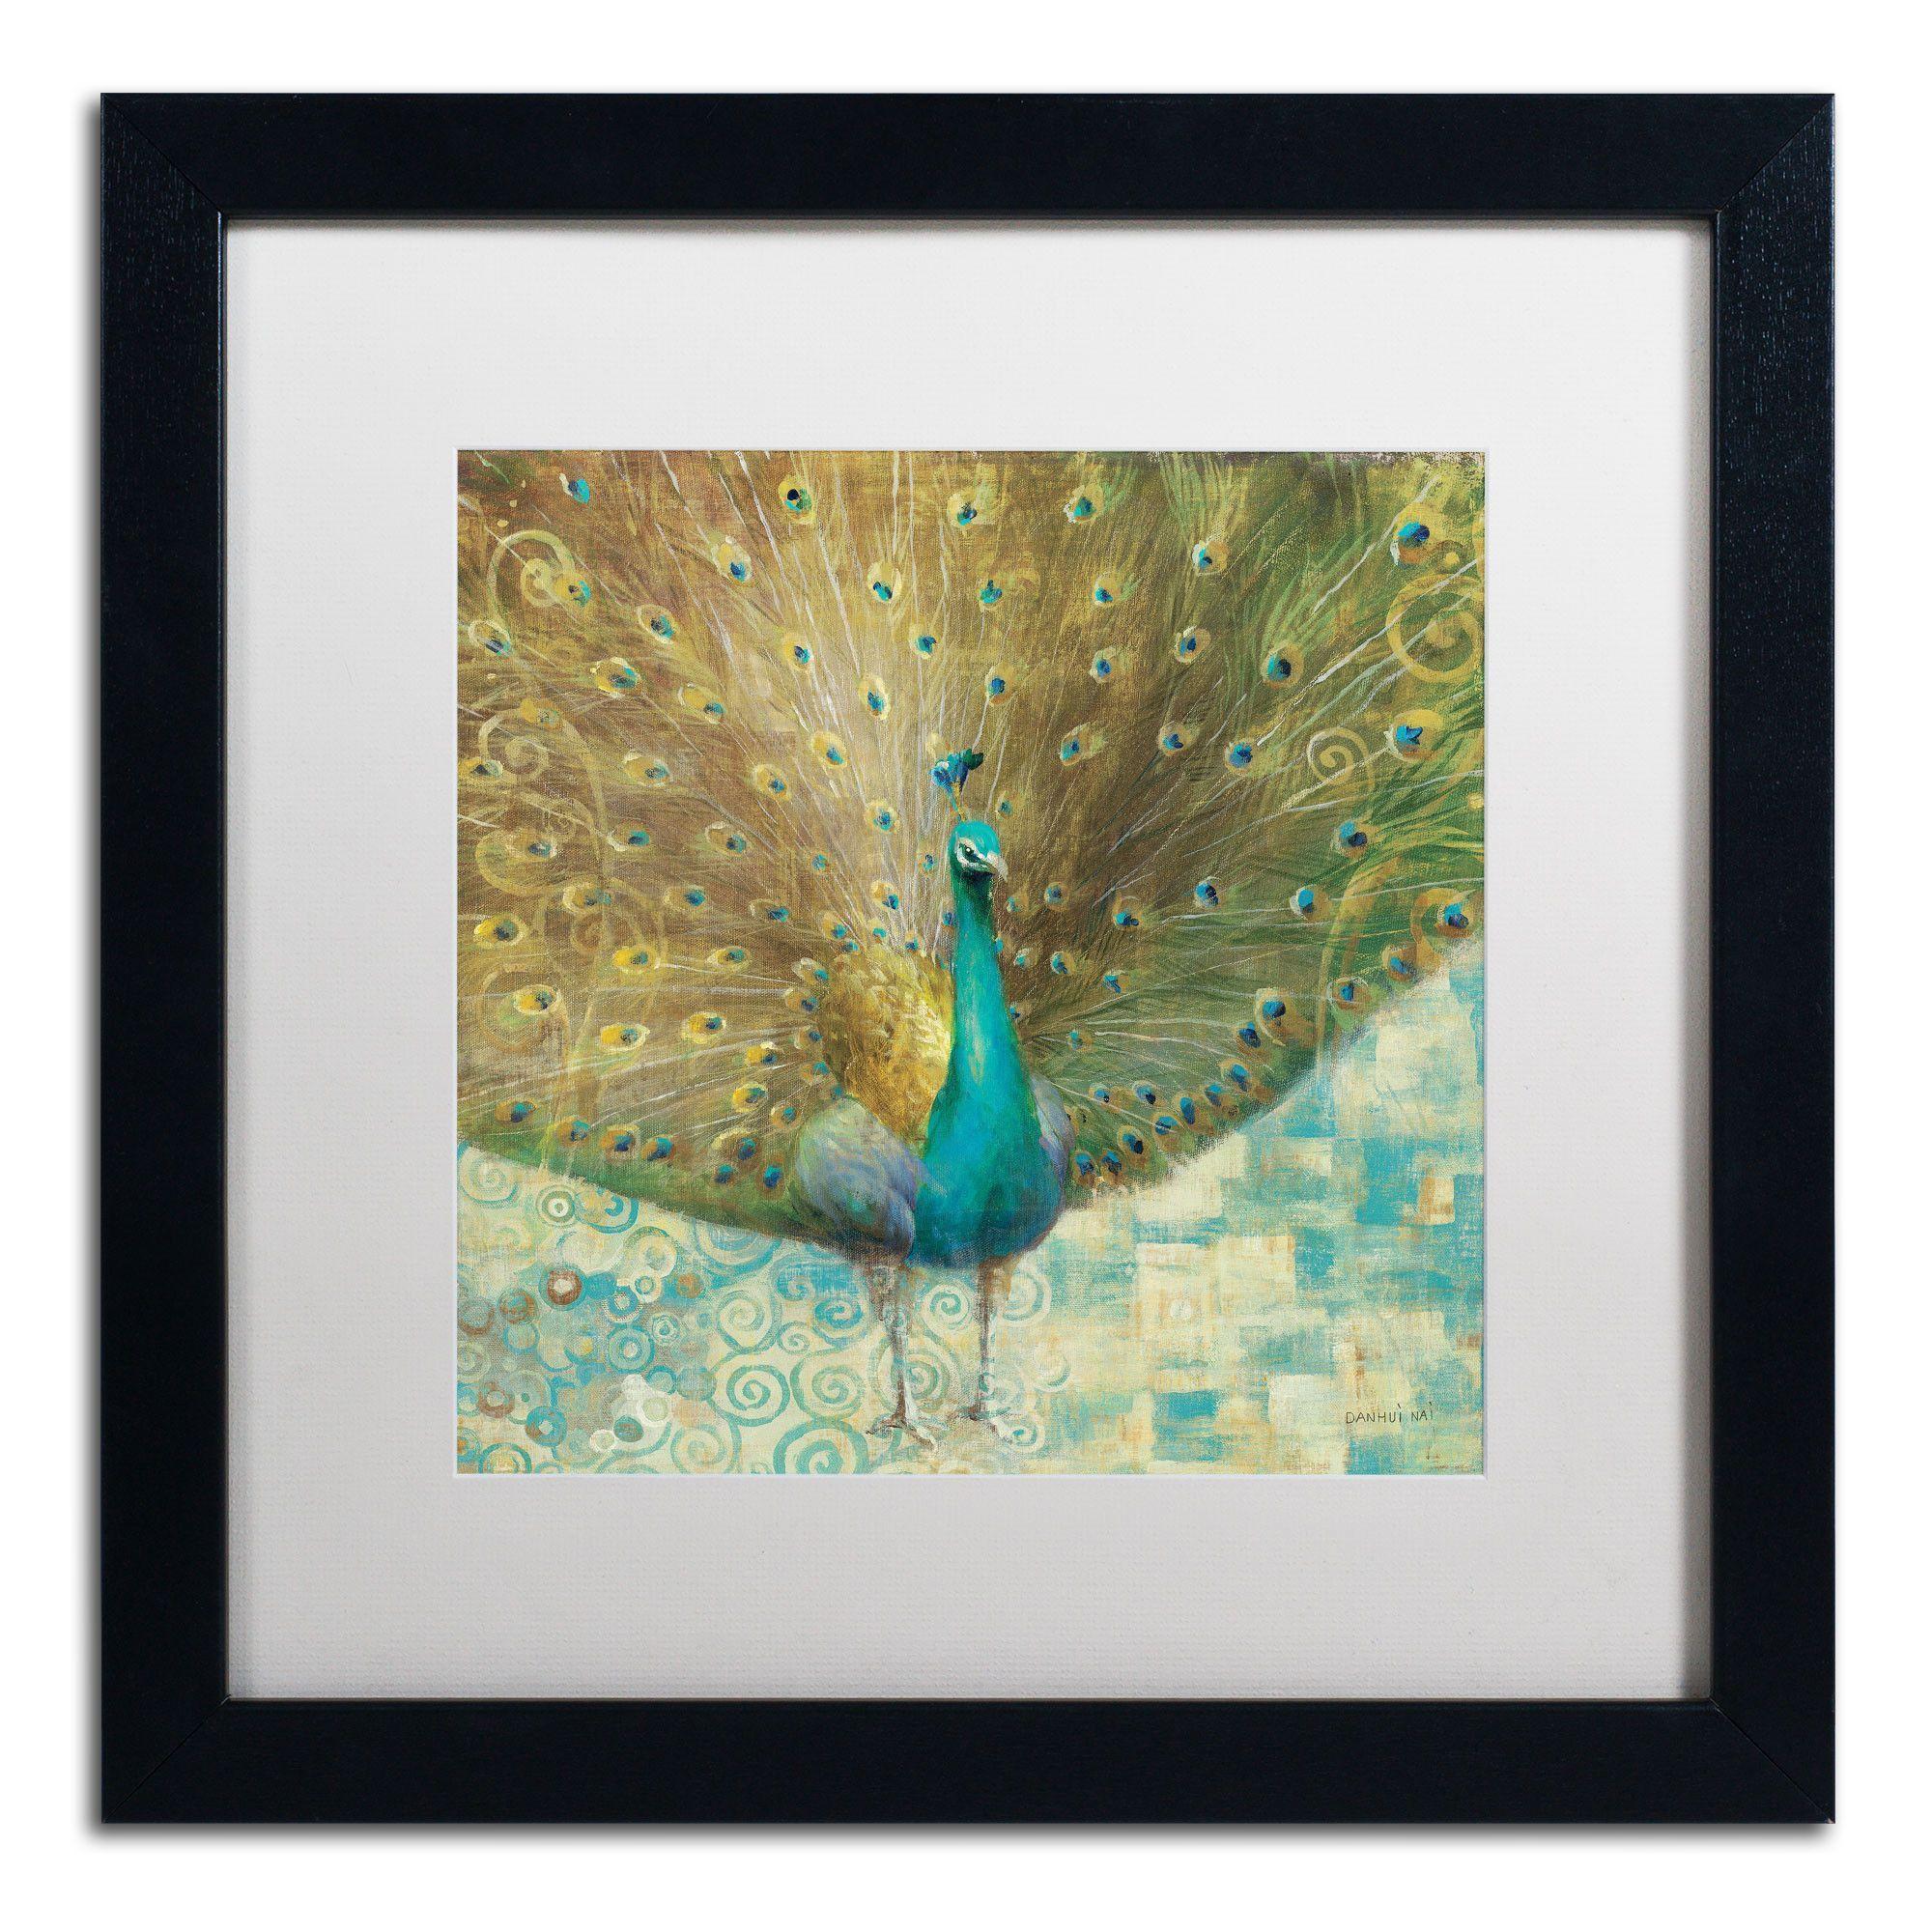 Teal peacock on goldu by danhui nai framed painting print